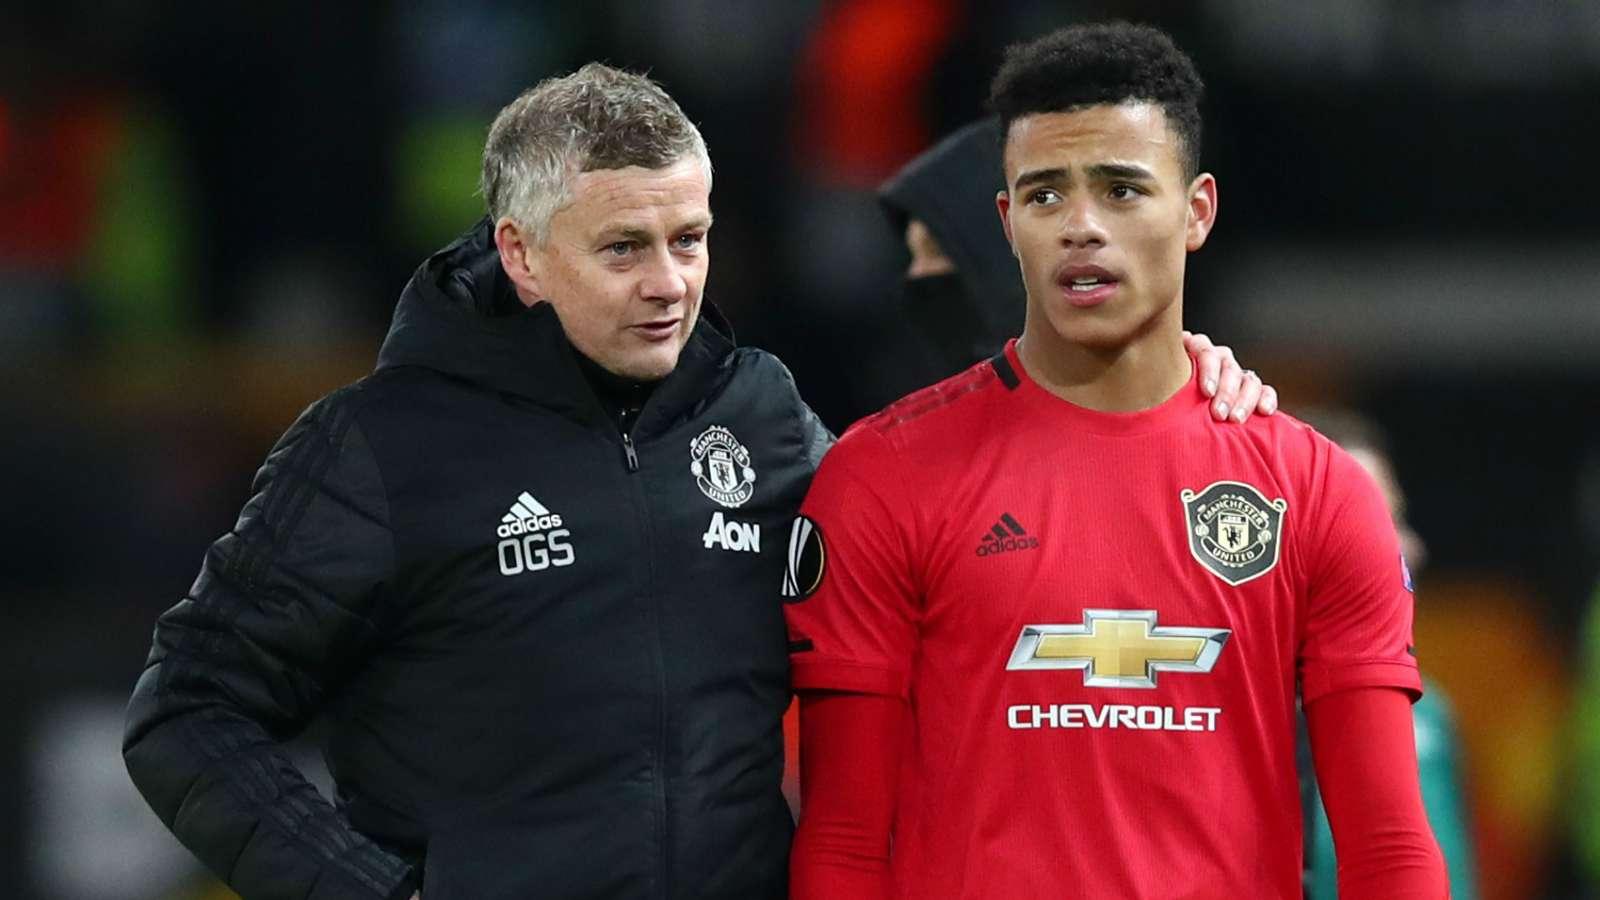 Ole Gunnar Solskjaer Mason Greenwood Manchester United 2019-20